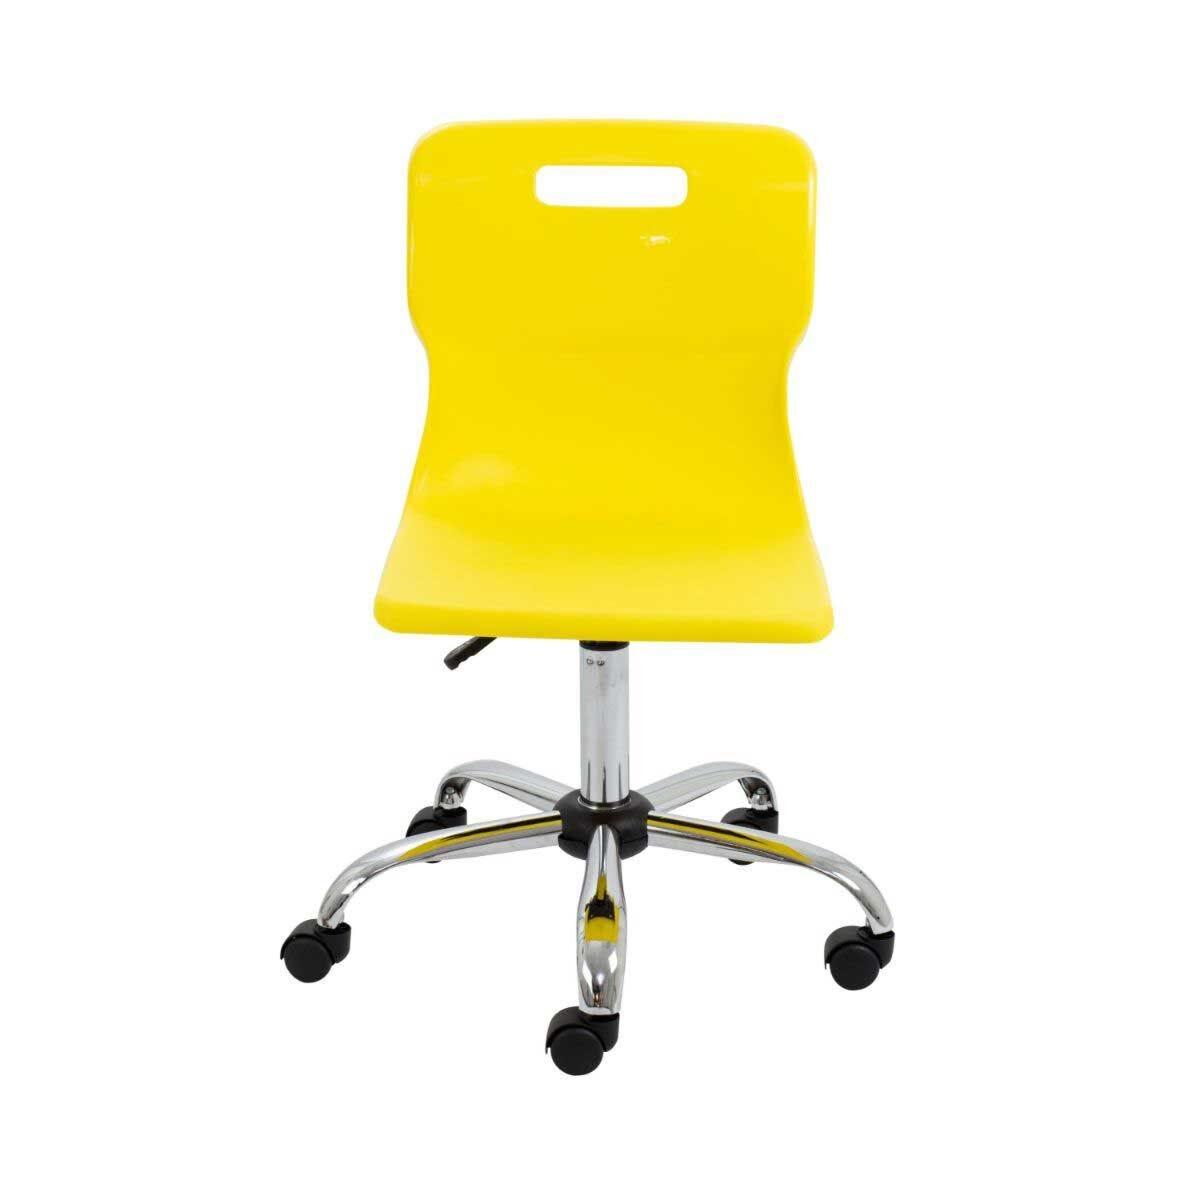 TC Office Titan Swivel Senior Chair with Castors 435-525mm Yellow